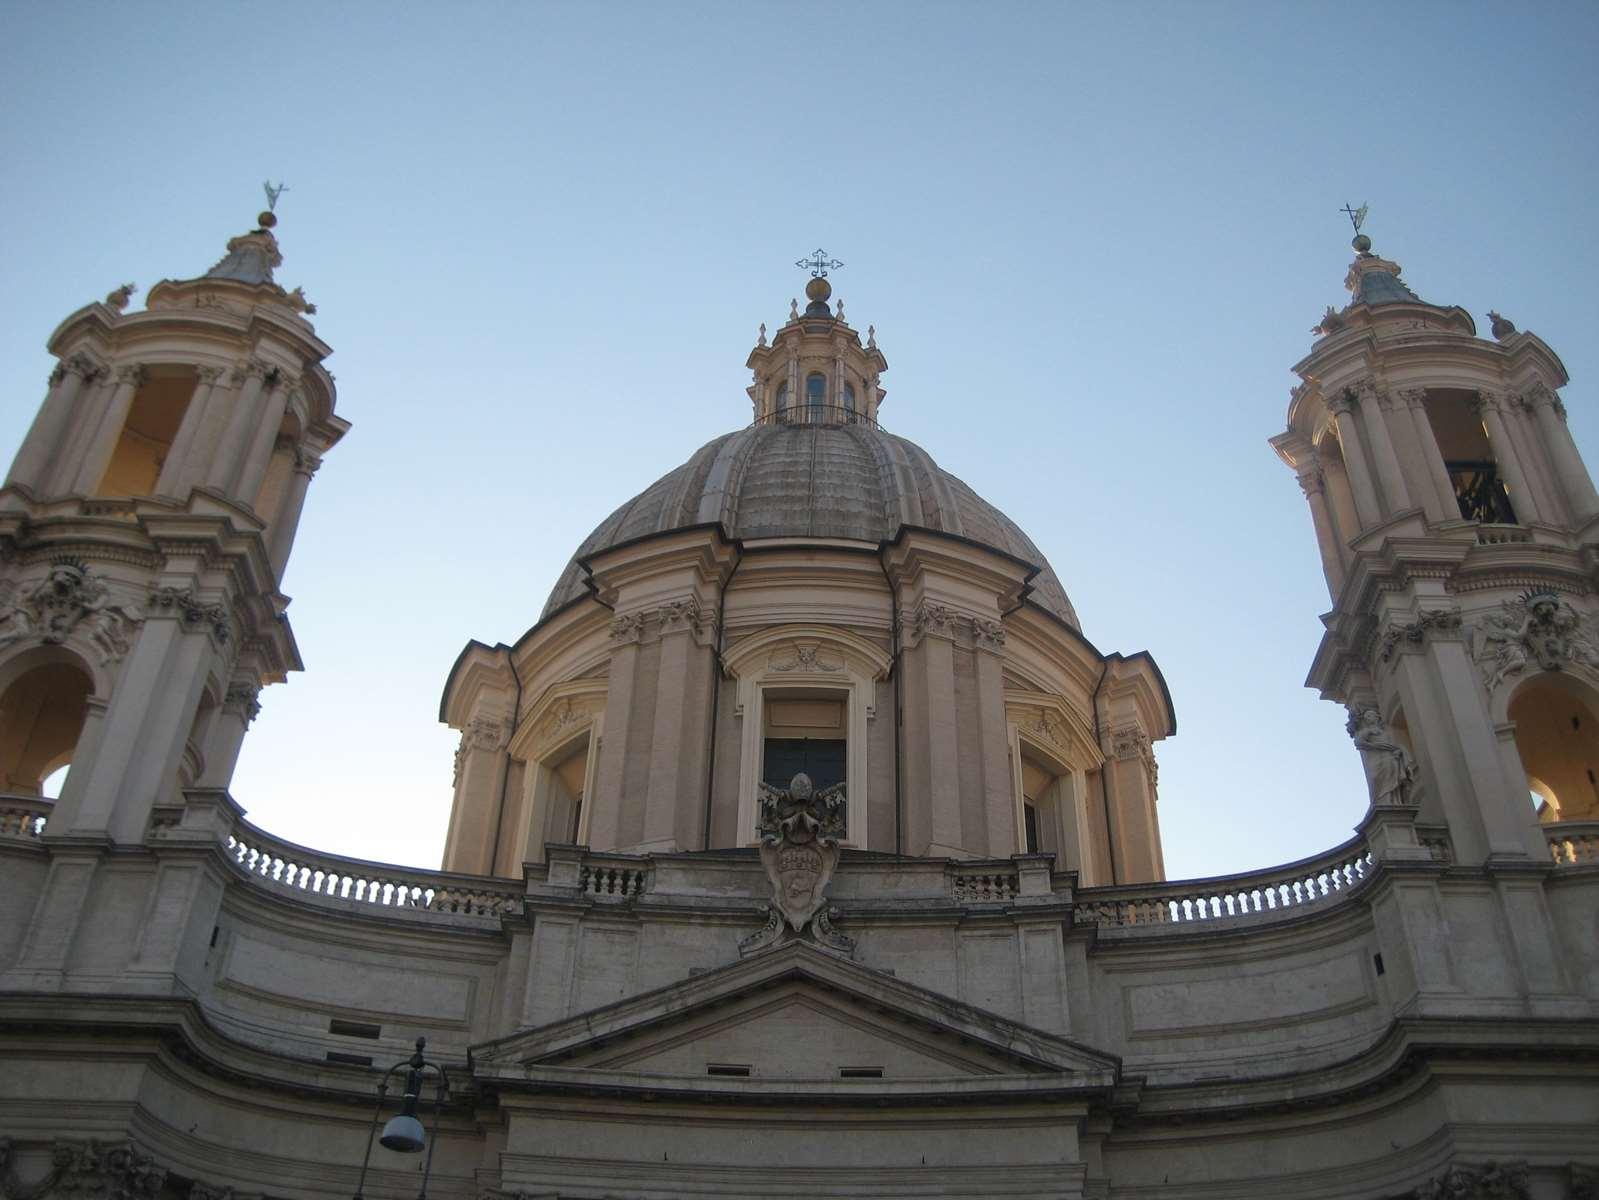 Italie-Rome piazza navona